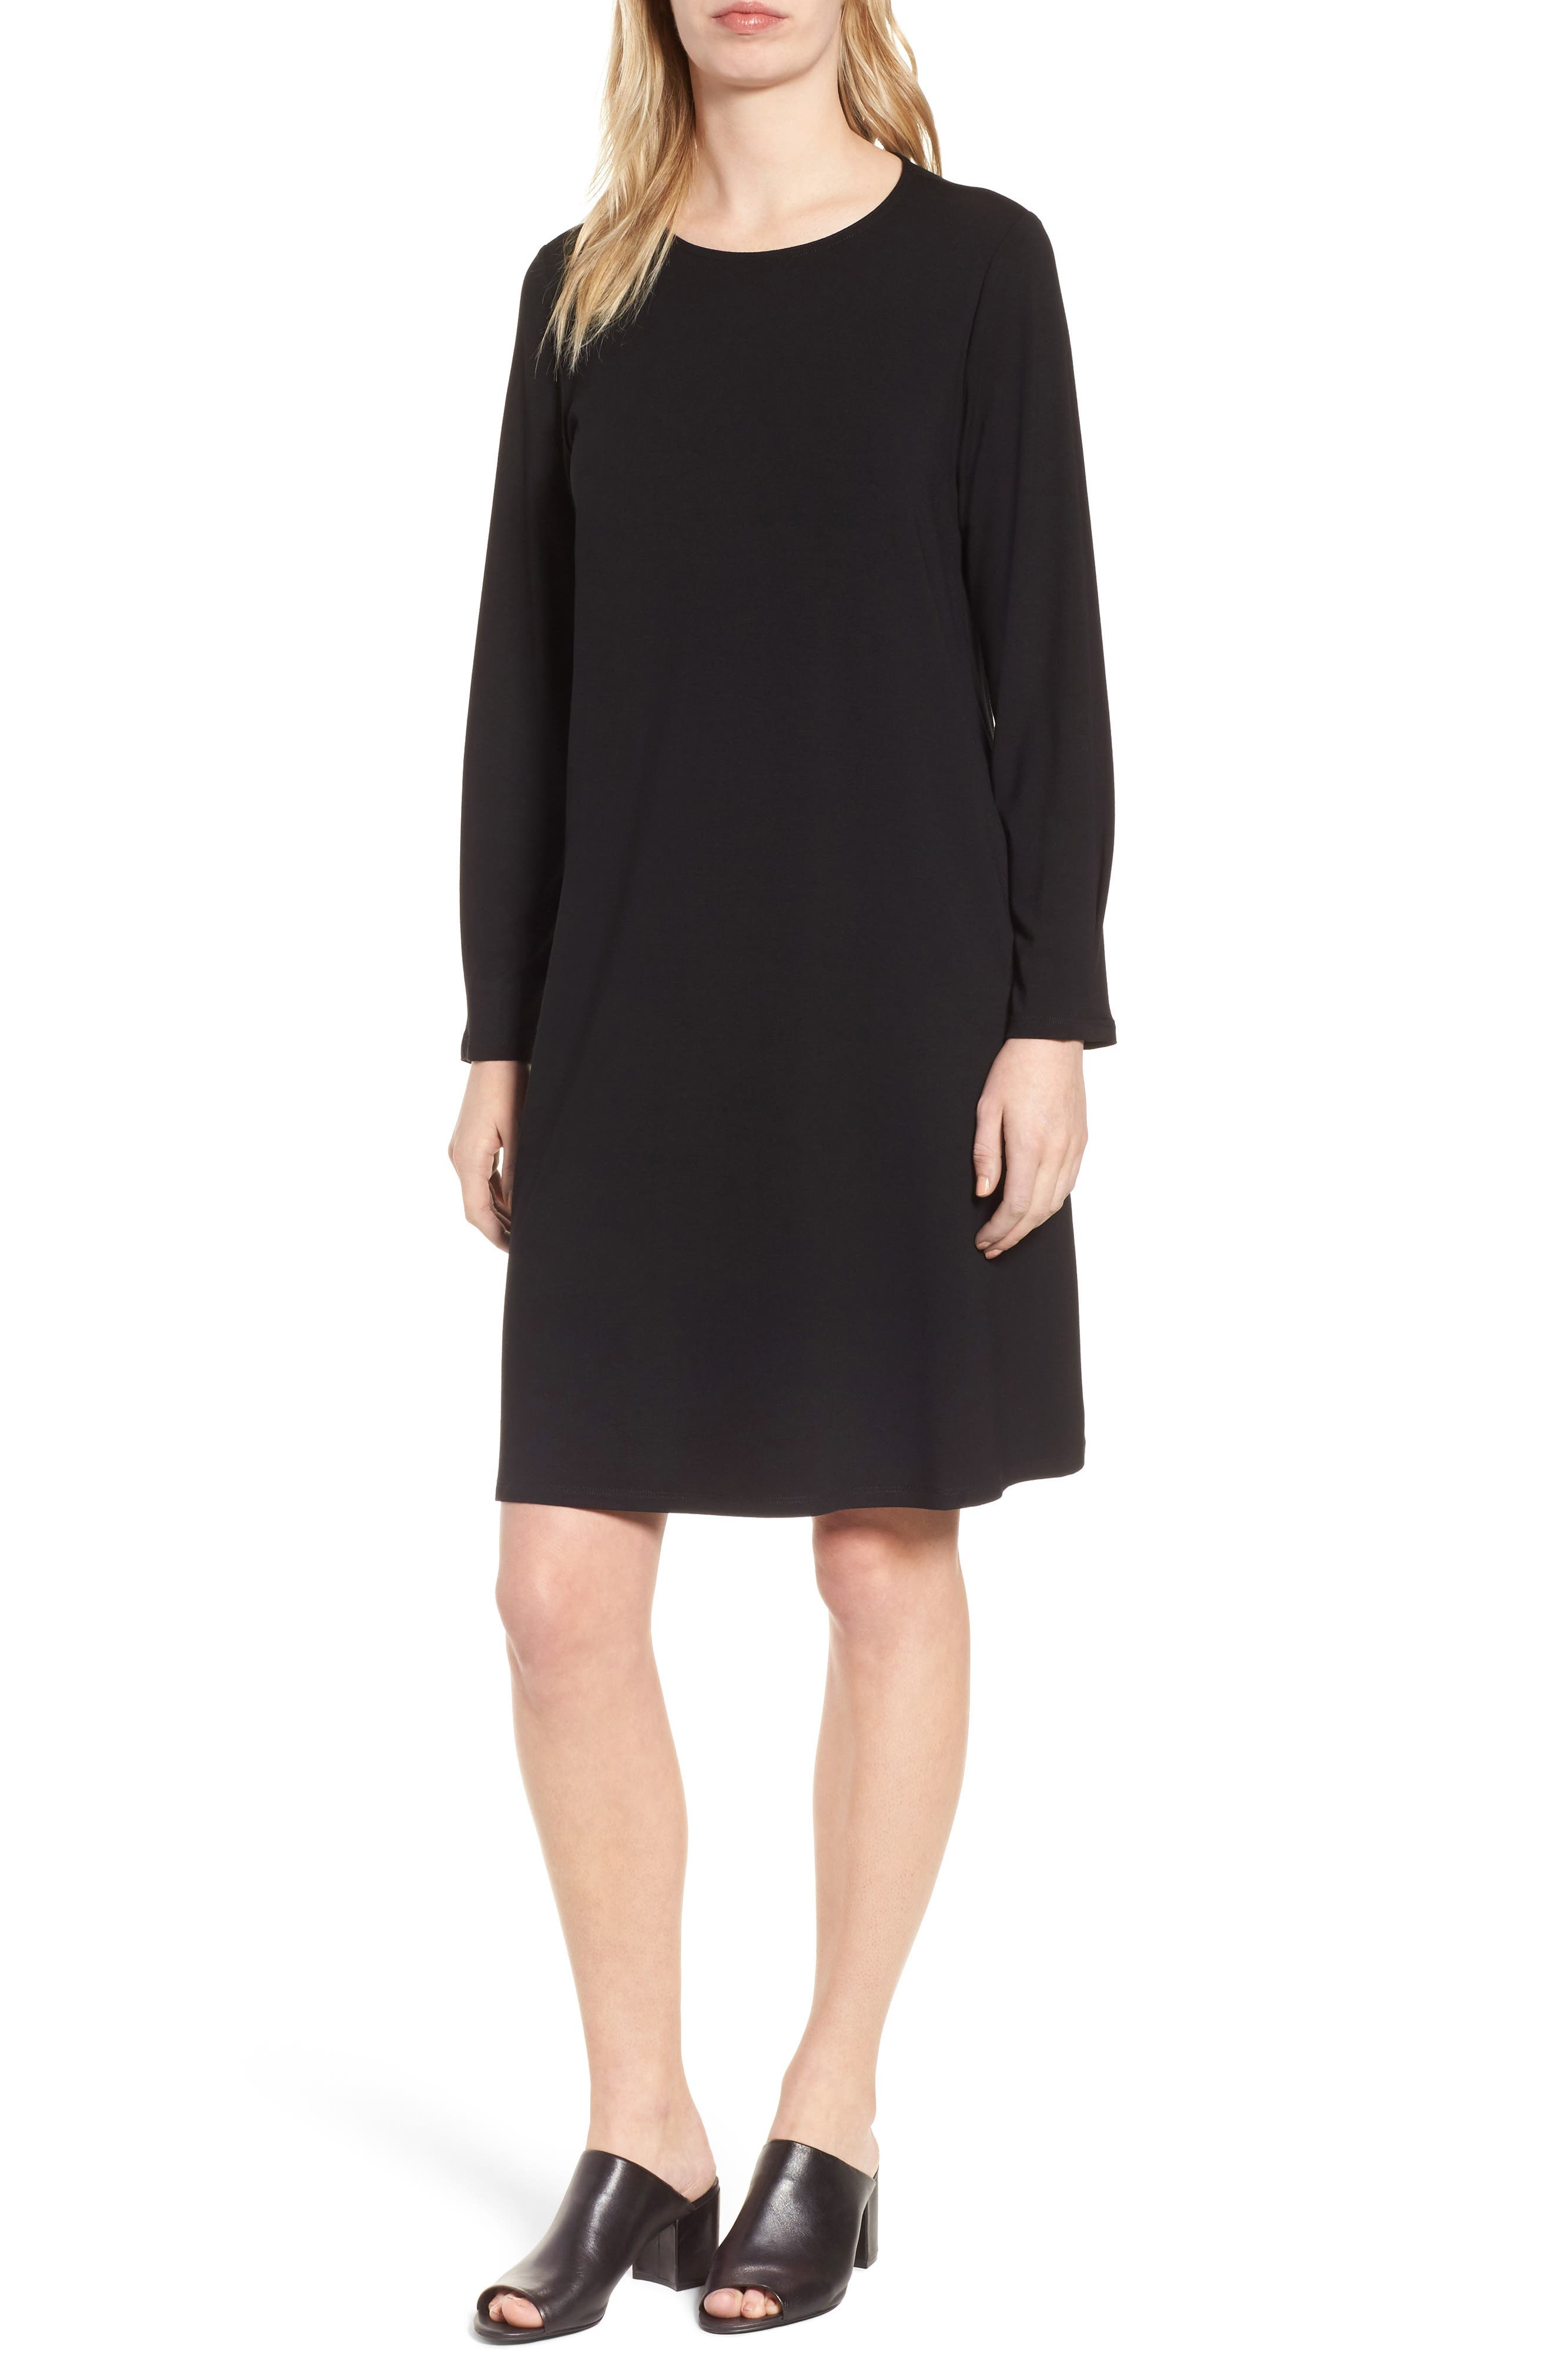 Alternate Image 1 Selected - Eileen Fisher Jersey Shift Dress